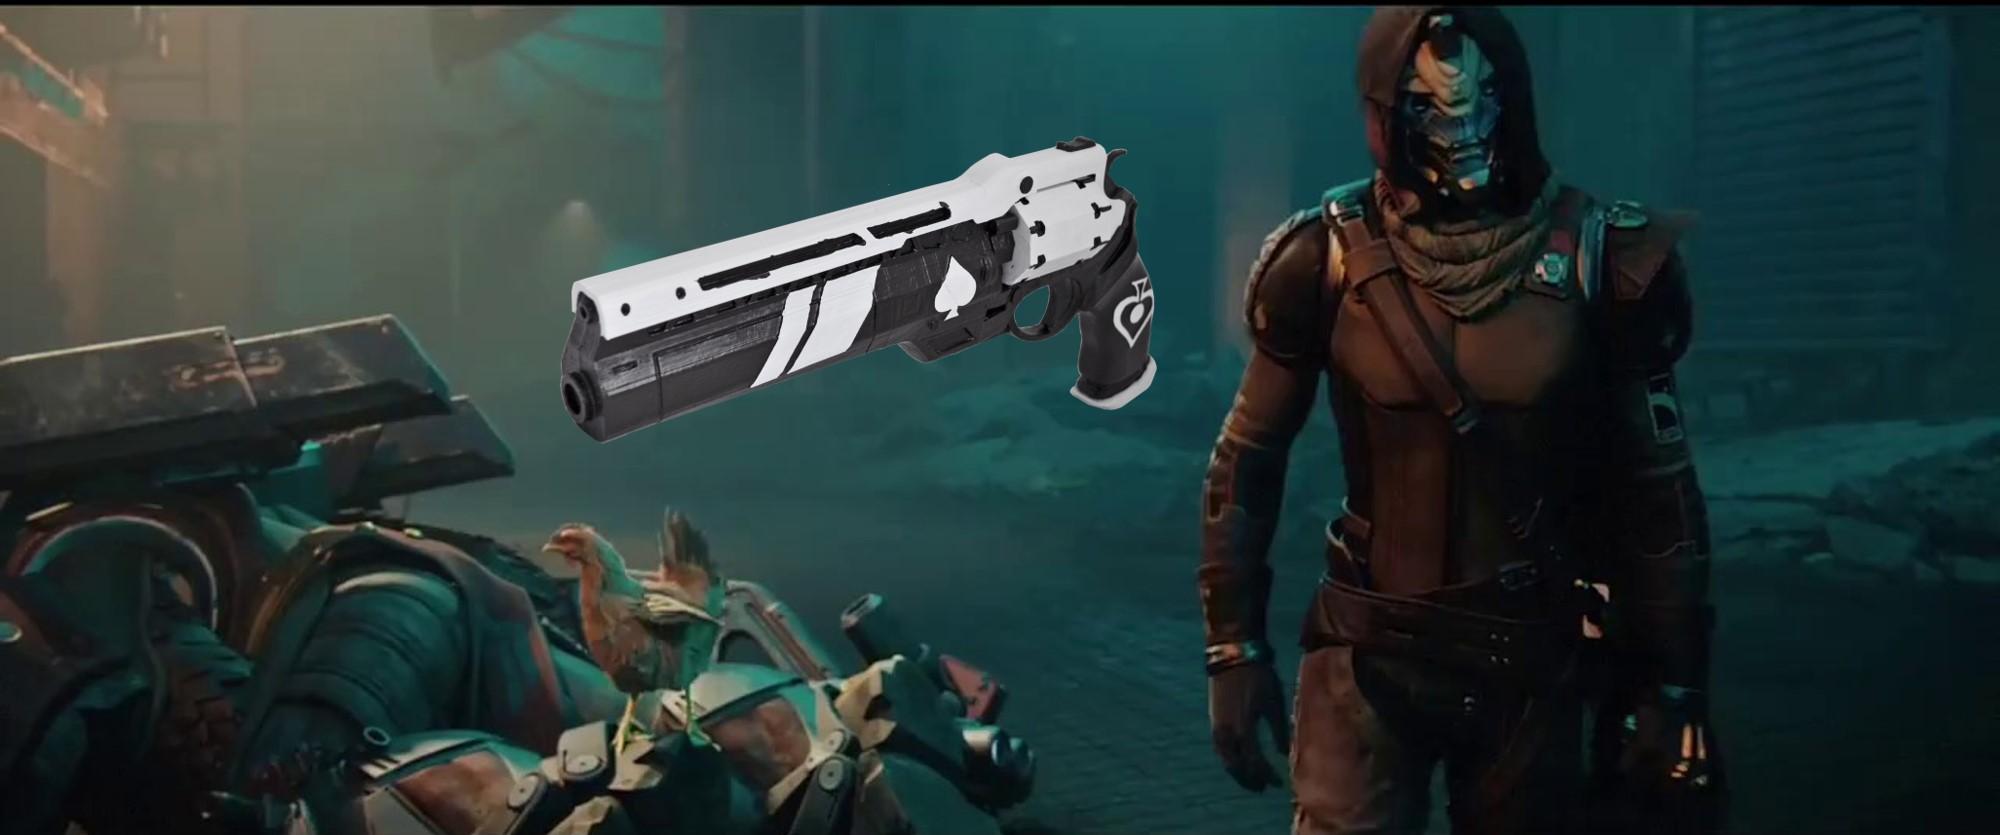 Destiny 2 huldigt dem Huhn seines Heldens, Cayde-6